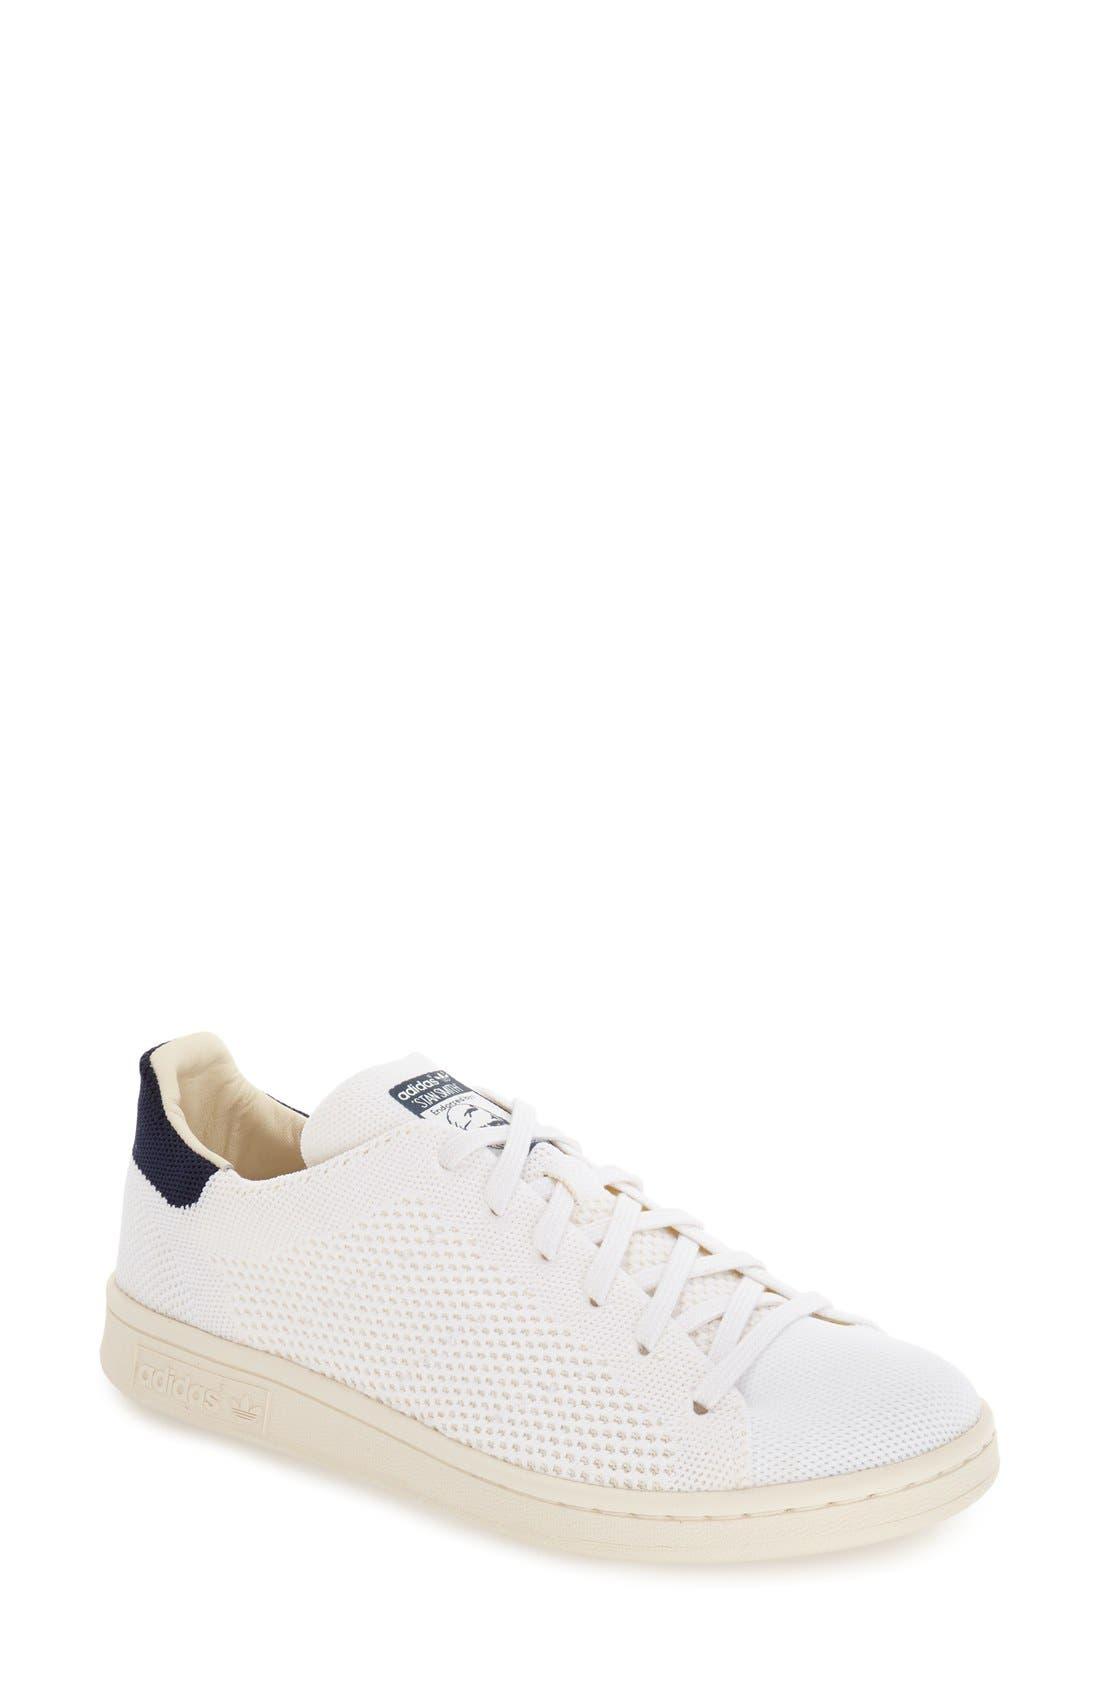 ADIDAS Stan Smith Primeknit Woven Sneaker